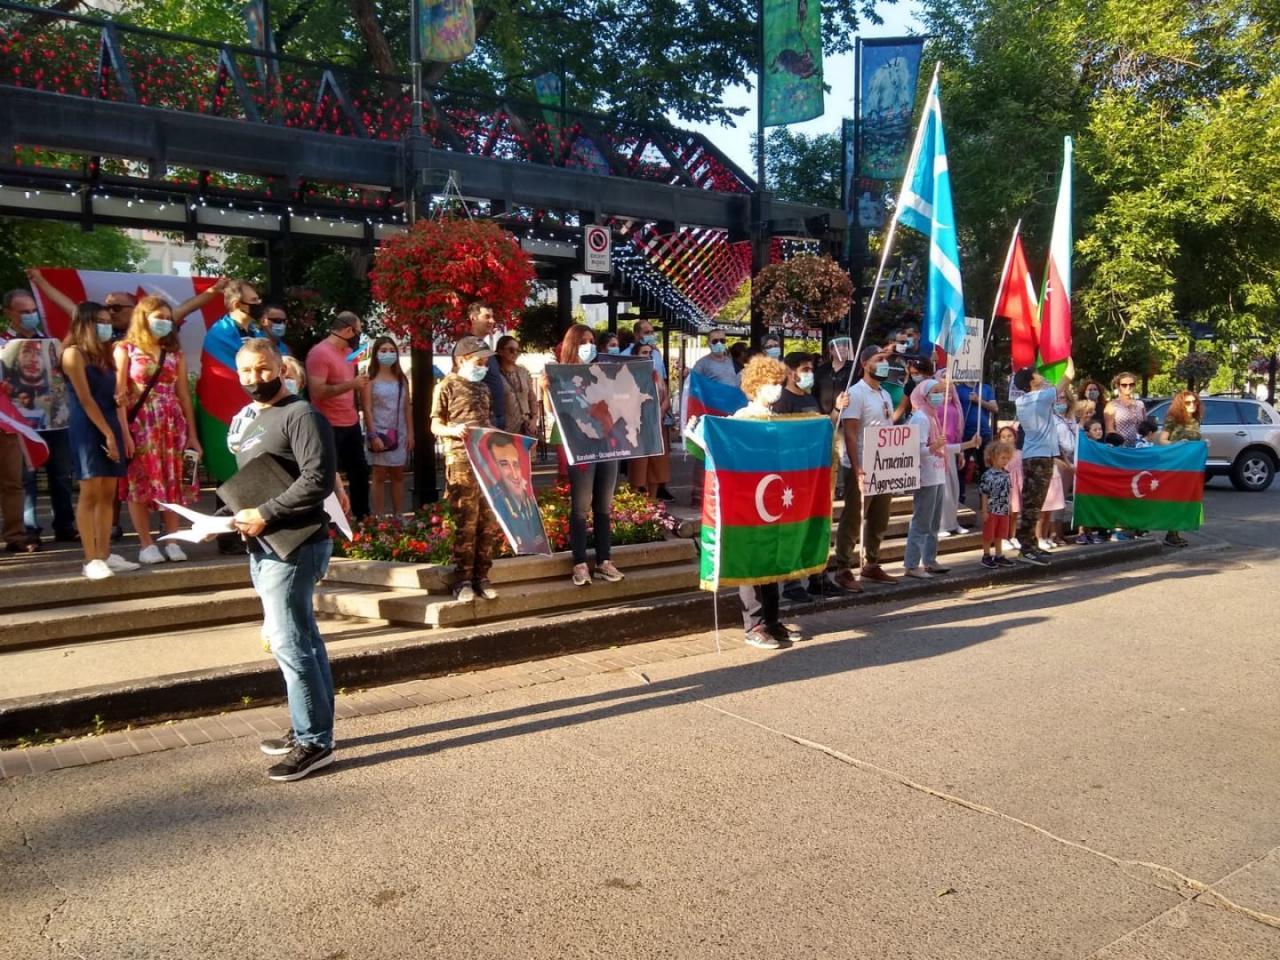 В центре канадского Калгари возвышен государственный флаг Азербайджана